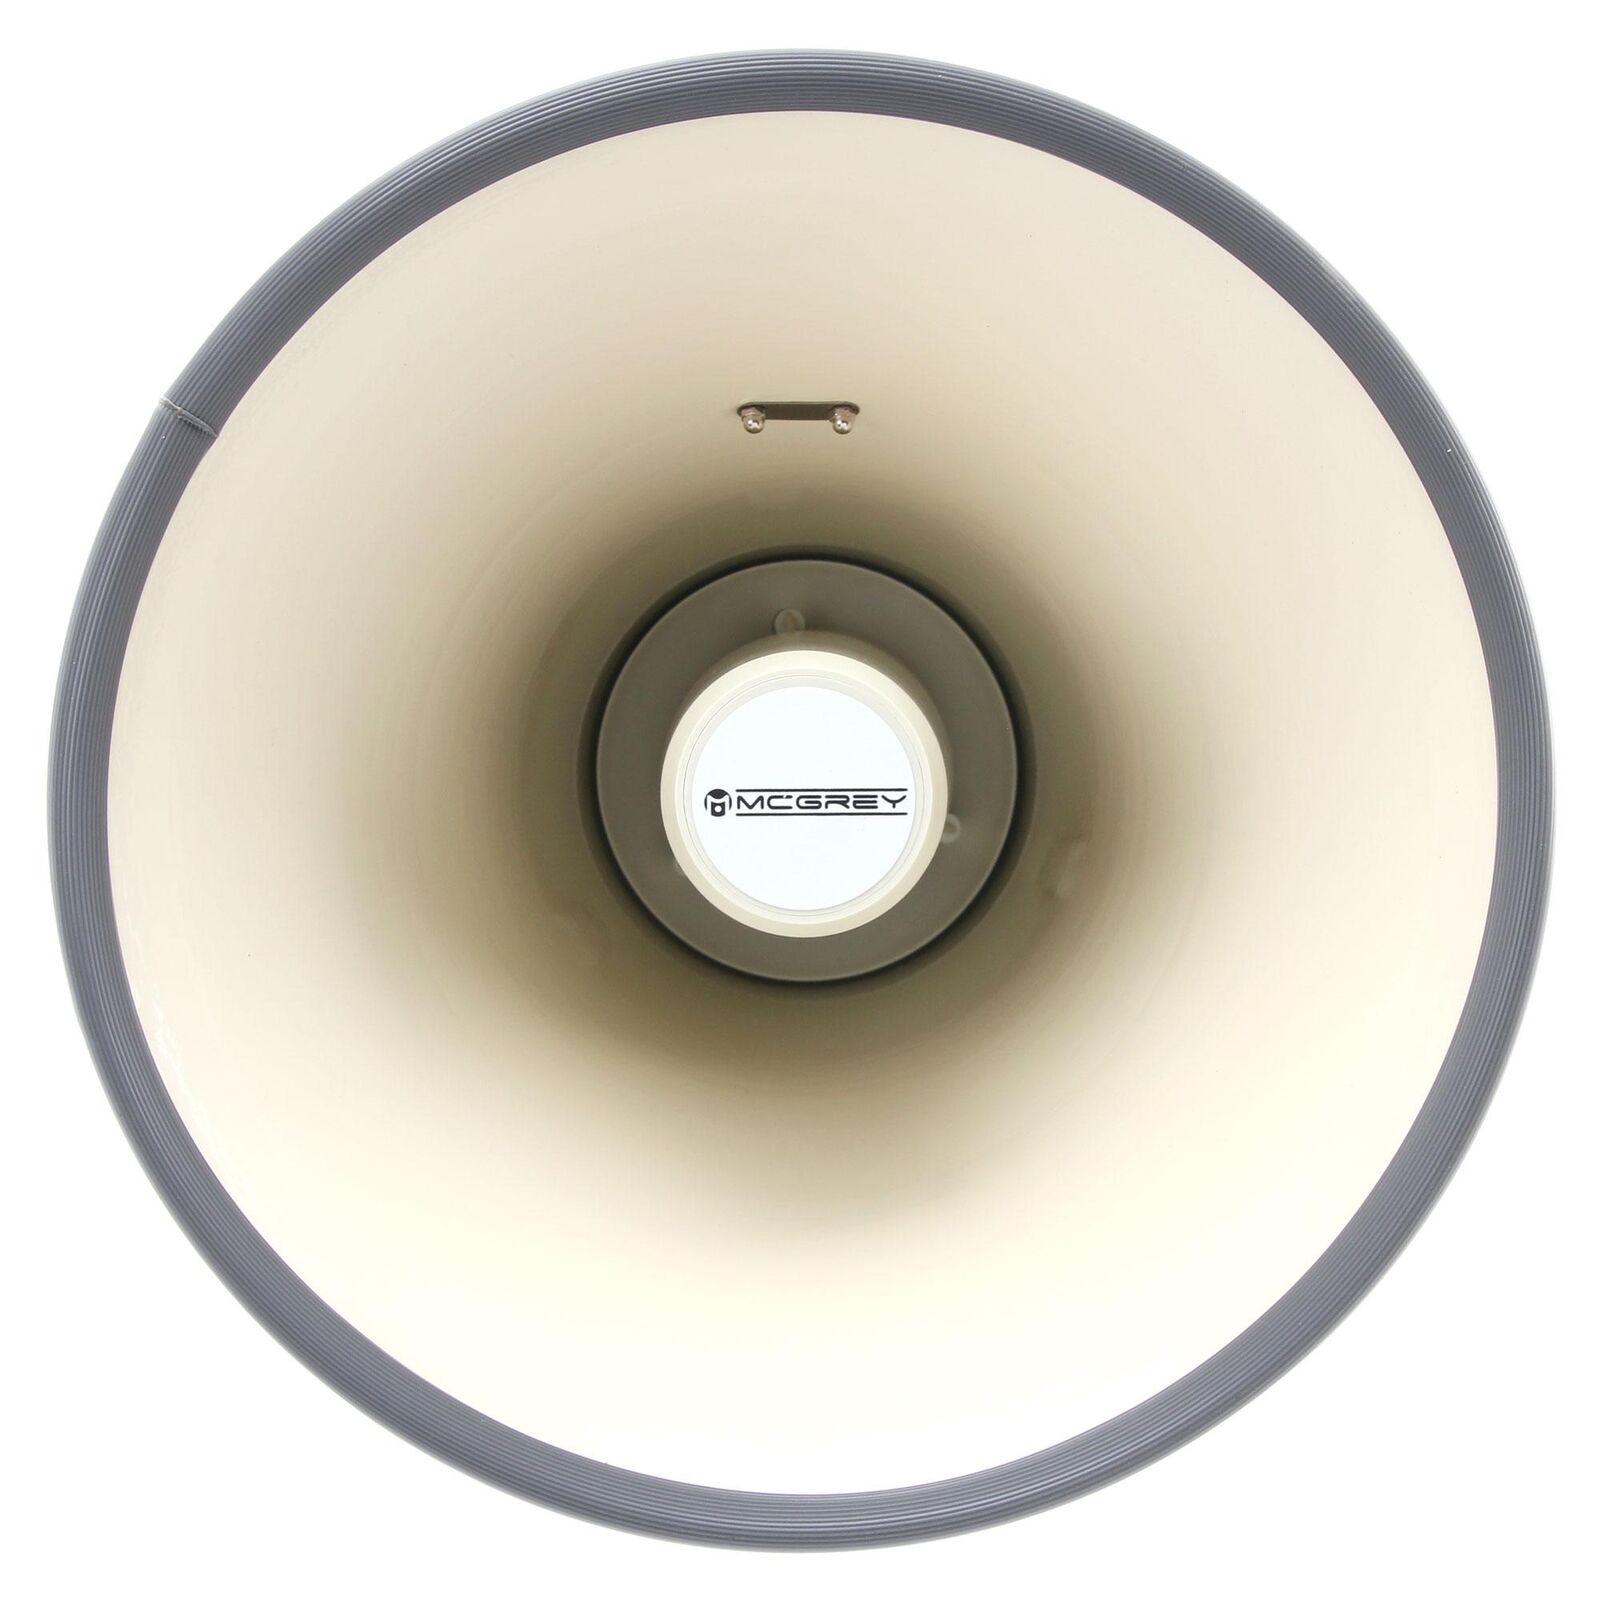 Profi Megaphon Tröte Megafon 2400m Sprachrohr Lautsprecher Sirene Recording 100W 2400m Megafon 7c1de0